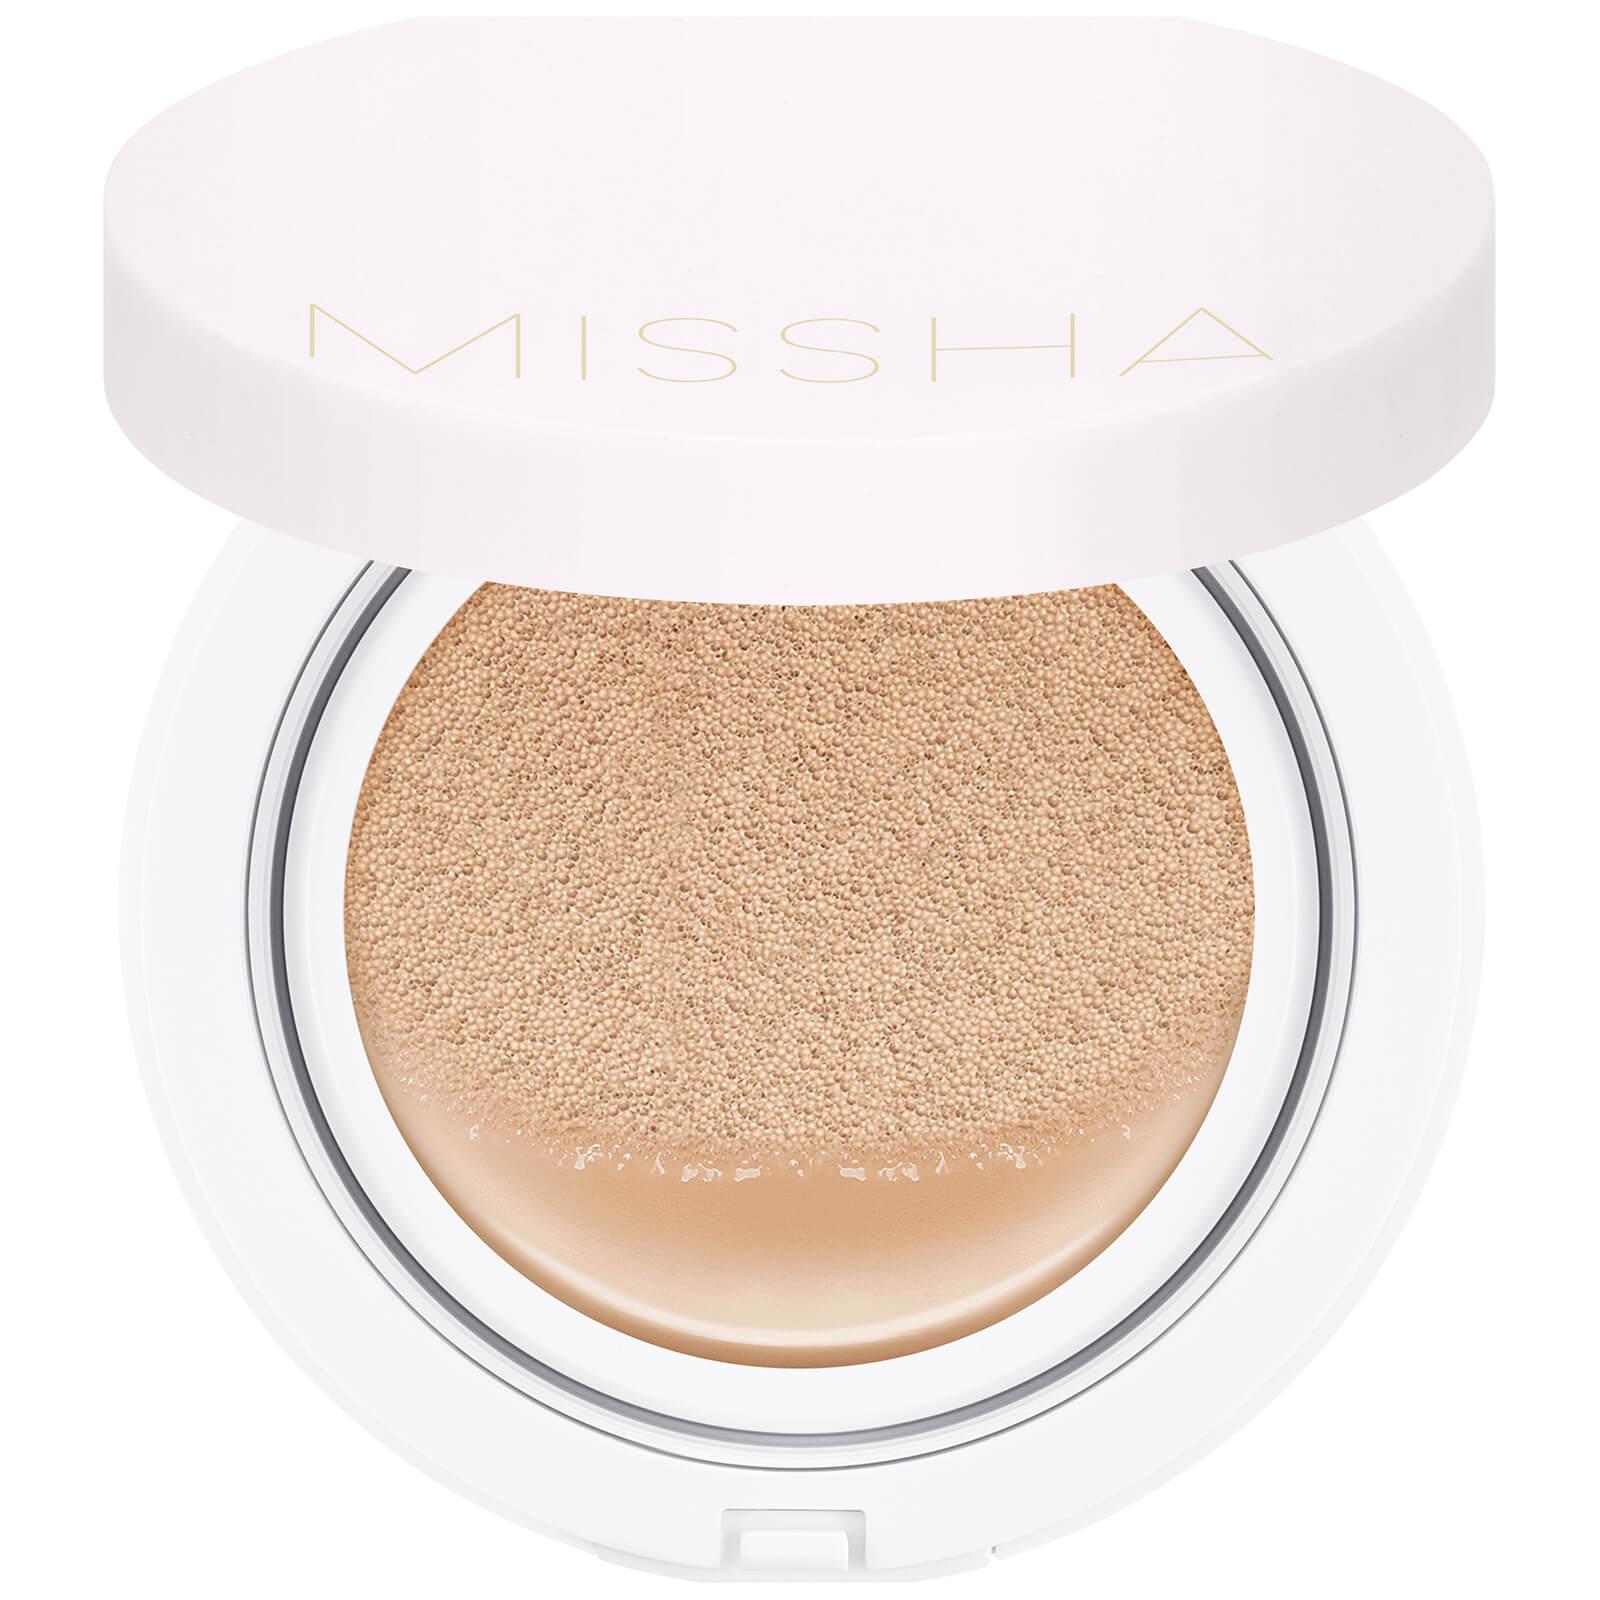 MISSHA Magic Cushion Cover Lasting SPF50+/PA+++ - No 23 15g